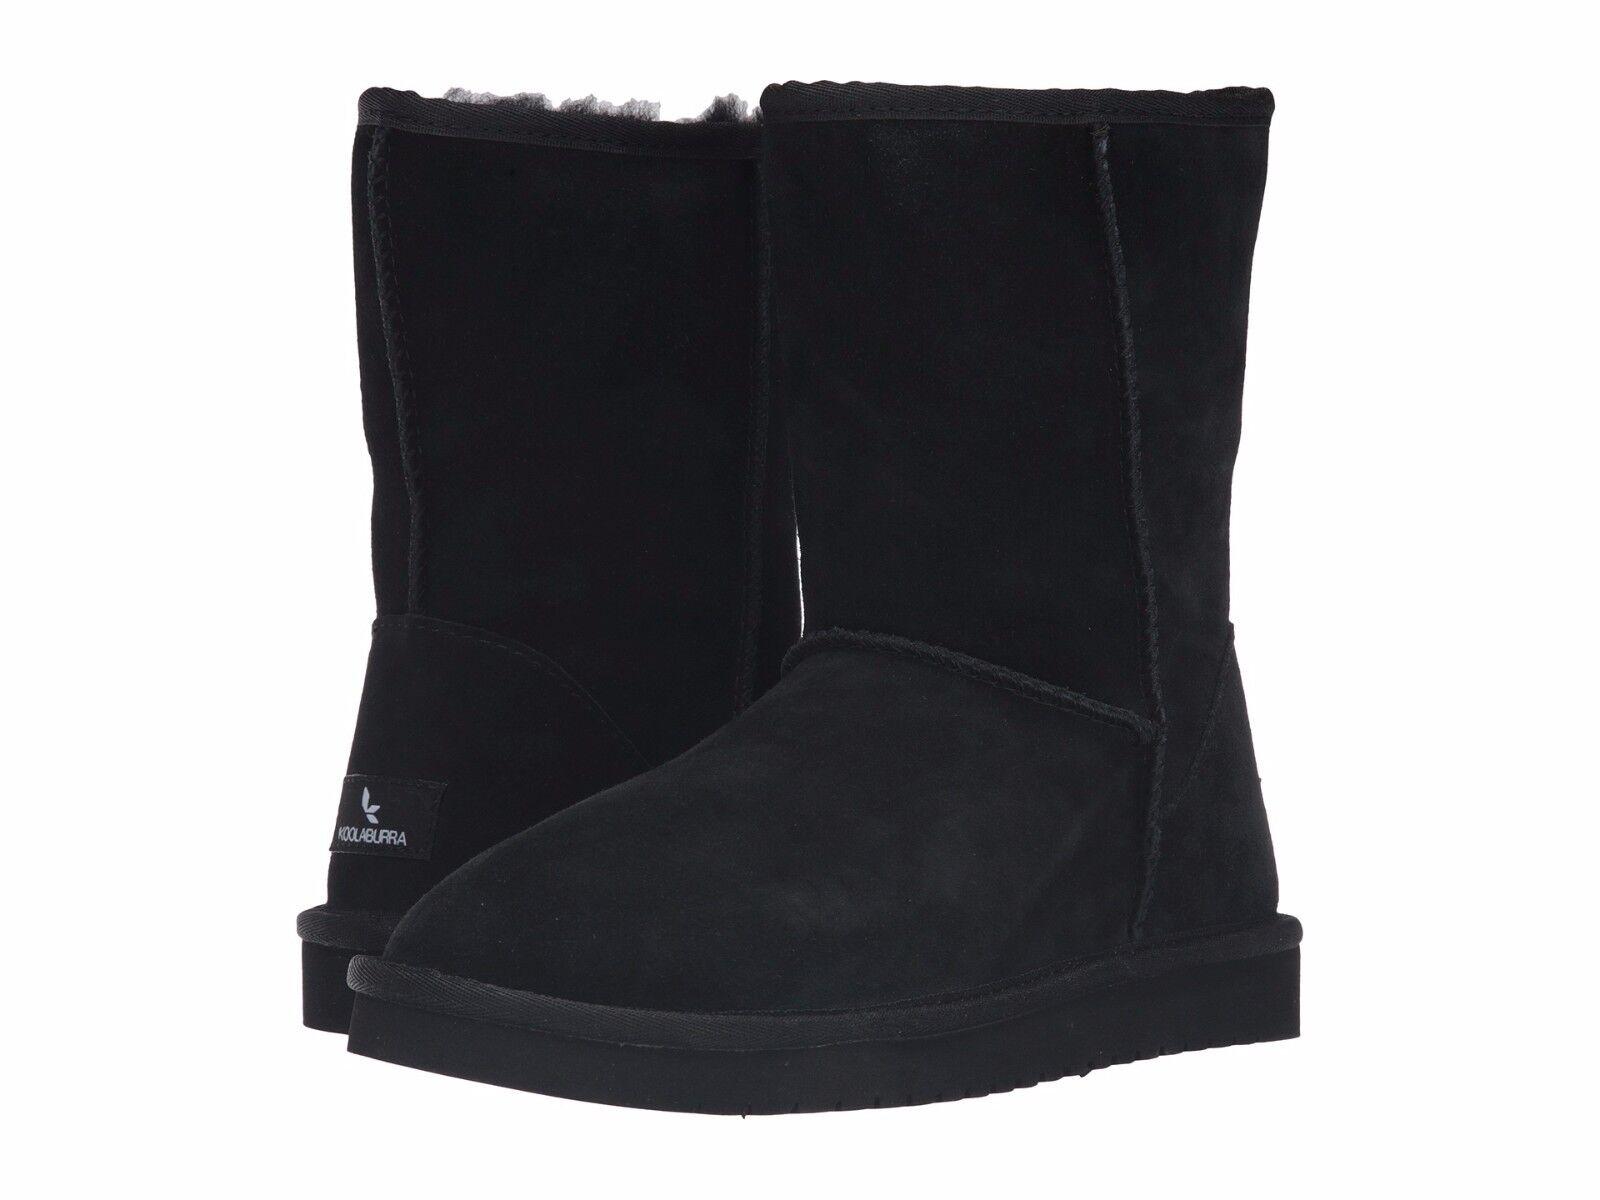 NEW NIB Women's Koolaburra Classic Short Winter Boots Choose Size Blk